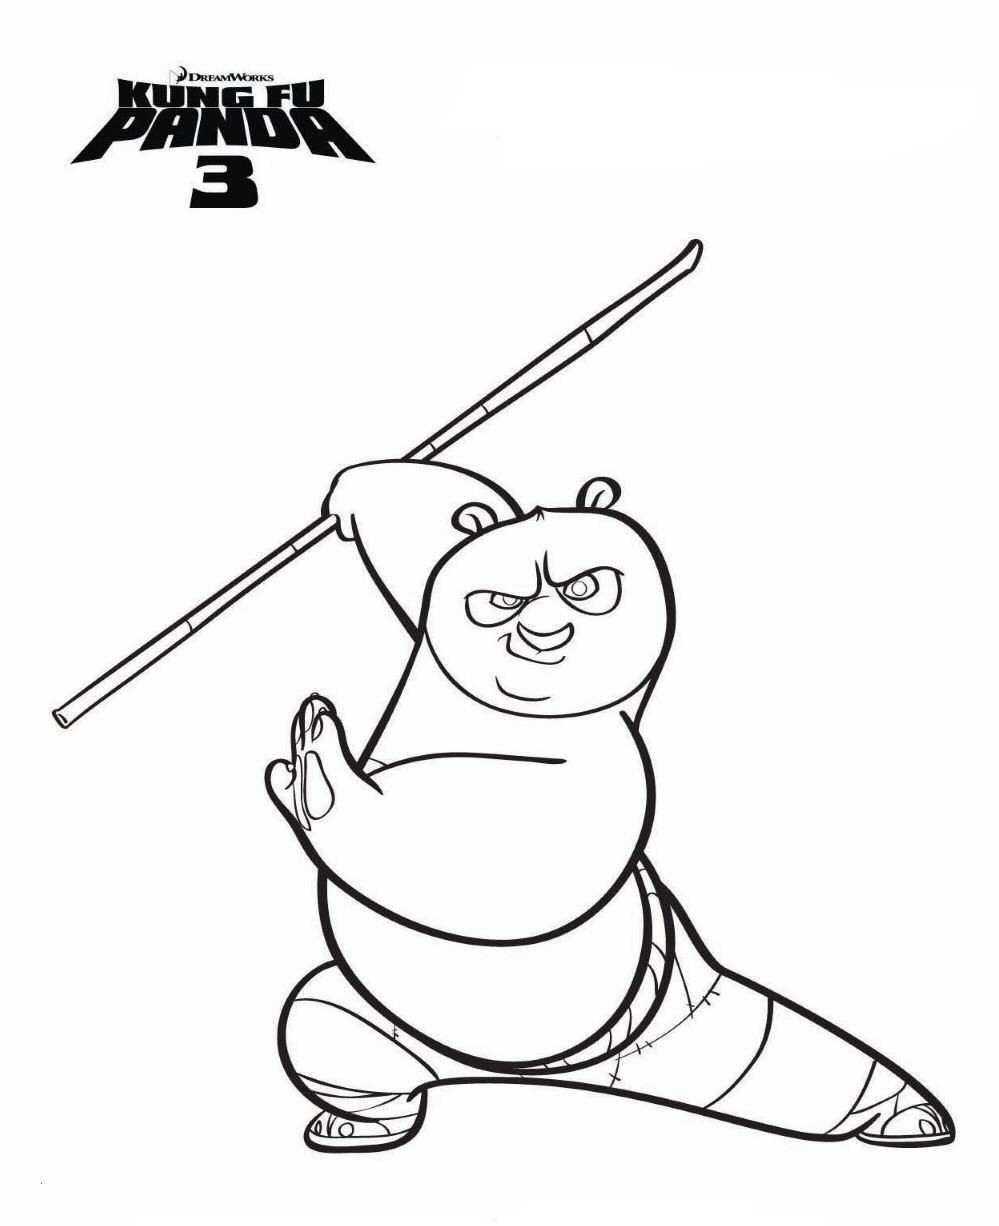 Kung Fu Panda Ausmalbilder Neu Kung Fu Panda Coloring Pages Luxury 27 Kung Fu Panda Coloring Pages Das Bild